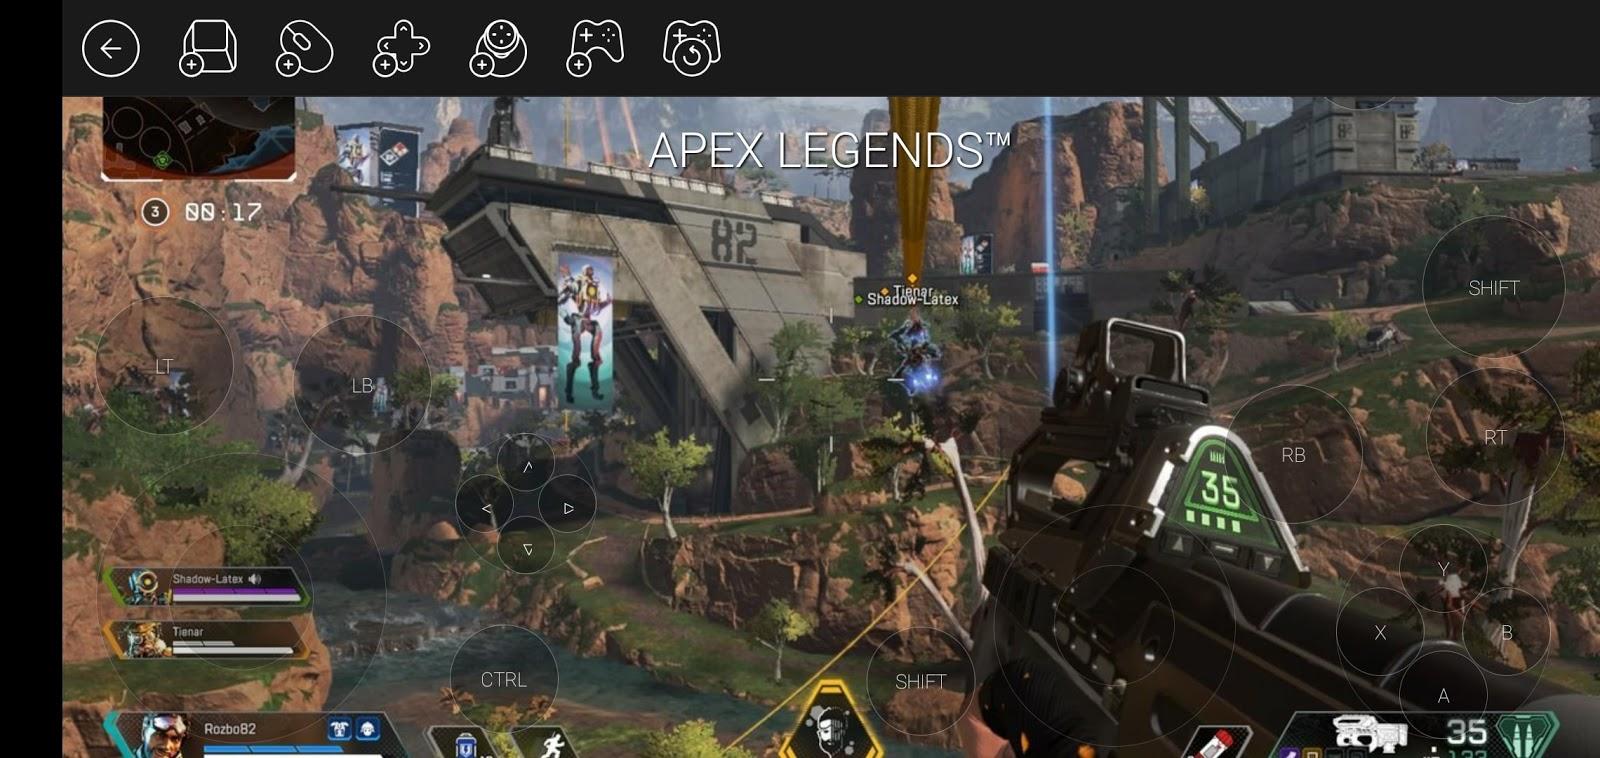 play apex legends in mobile working methods - apex legends